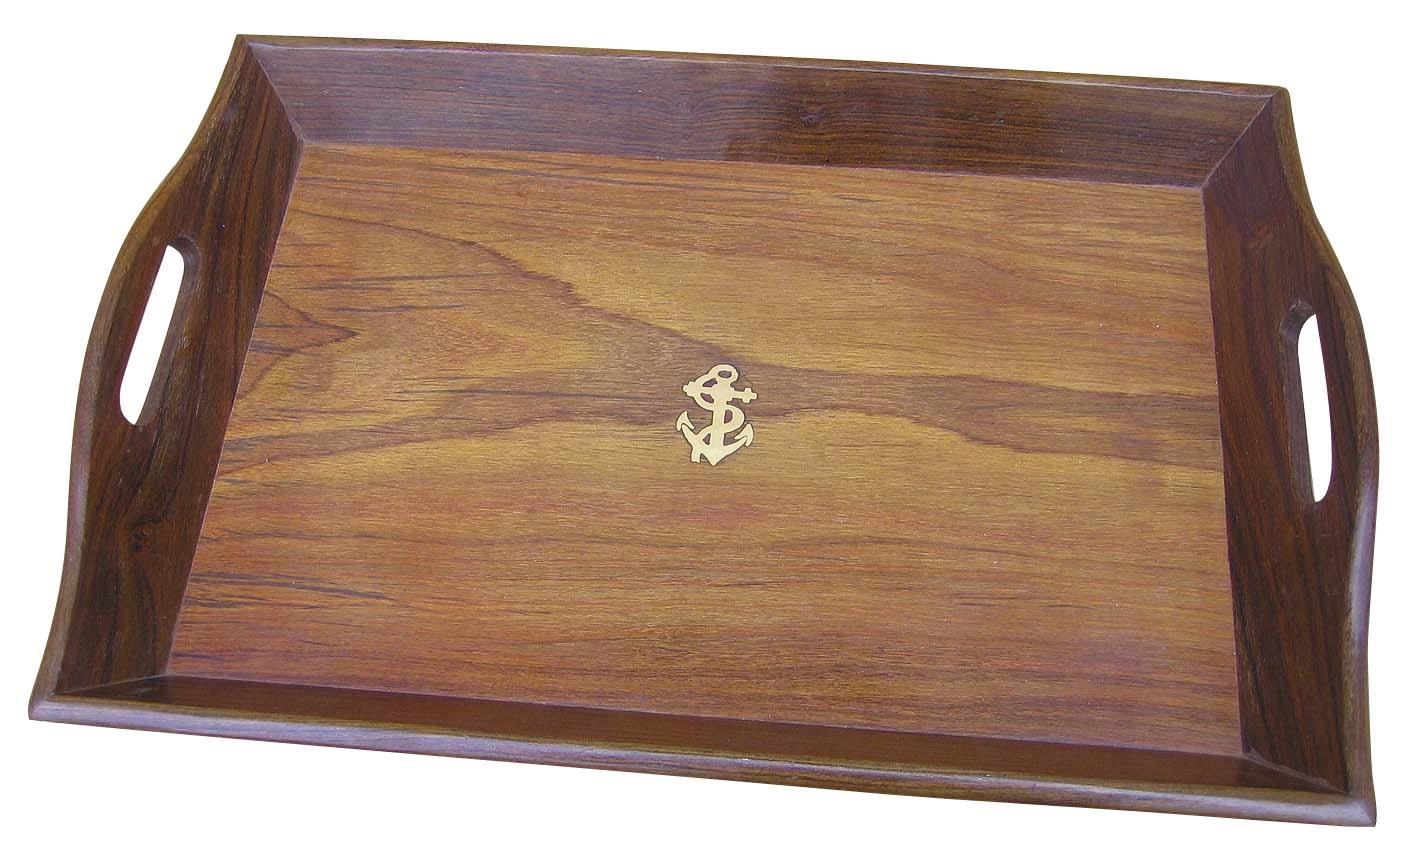 tablett gl ser sets tabletts maritim zuhause maritime klassiker mare me maritime. Black Bedroom Furniture Sets. Home Design Ideas